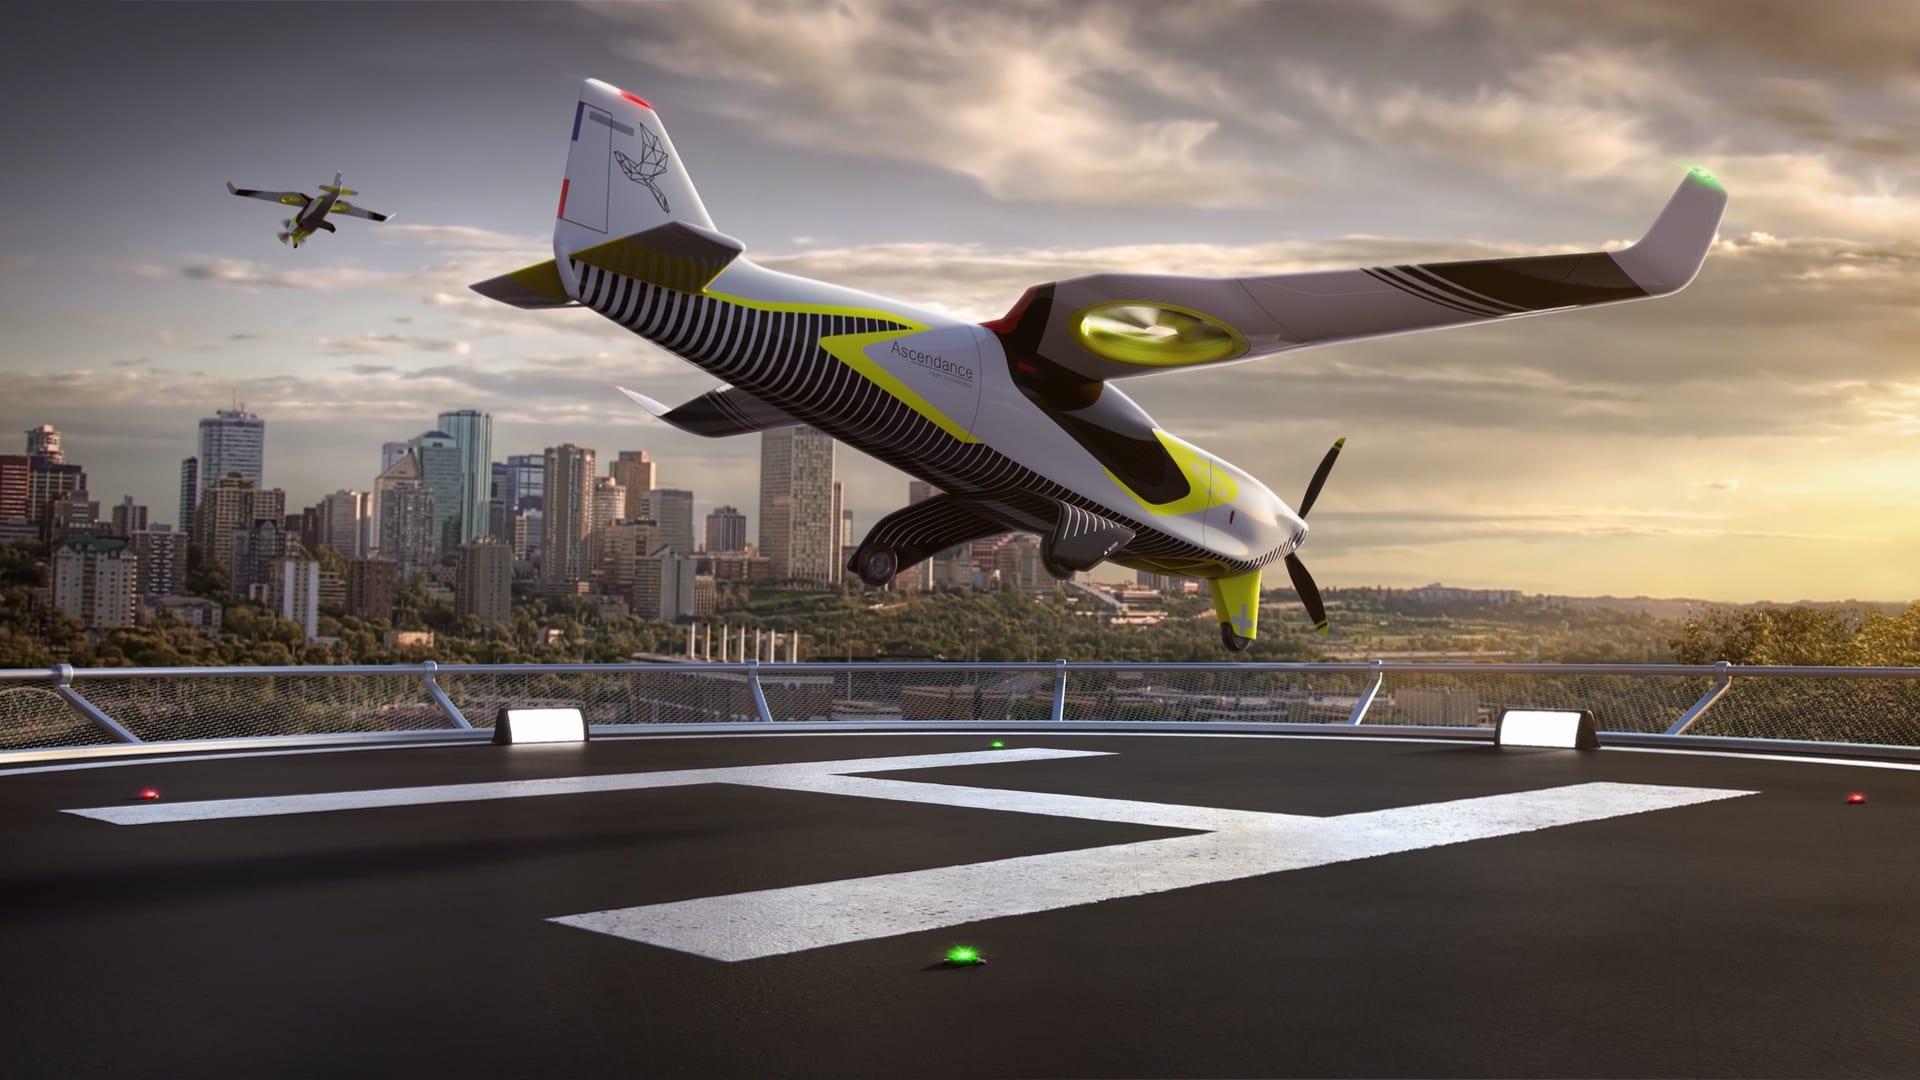 Ascendance low-emission hybrid VTOL Εναέρια Ταξί